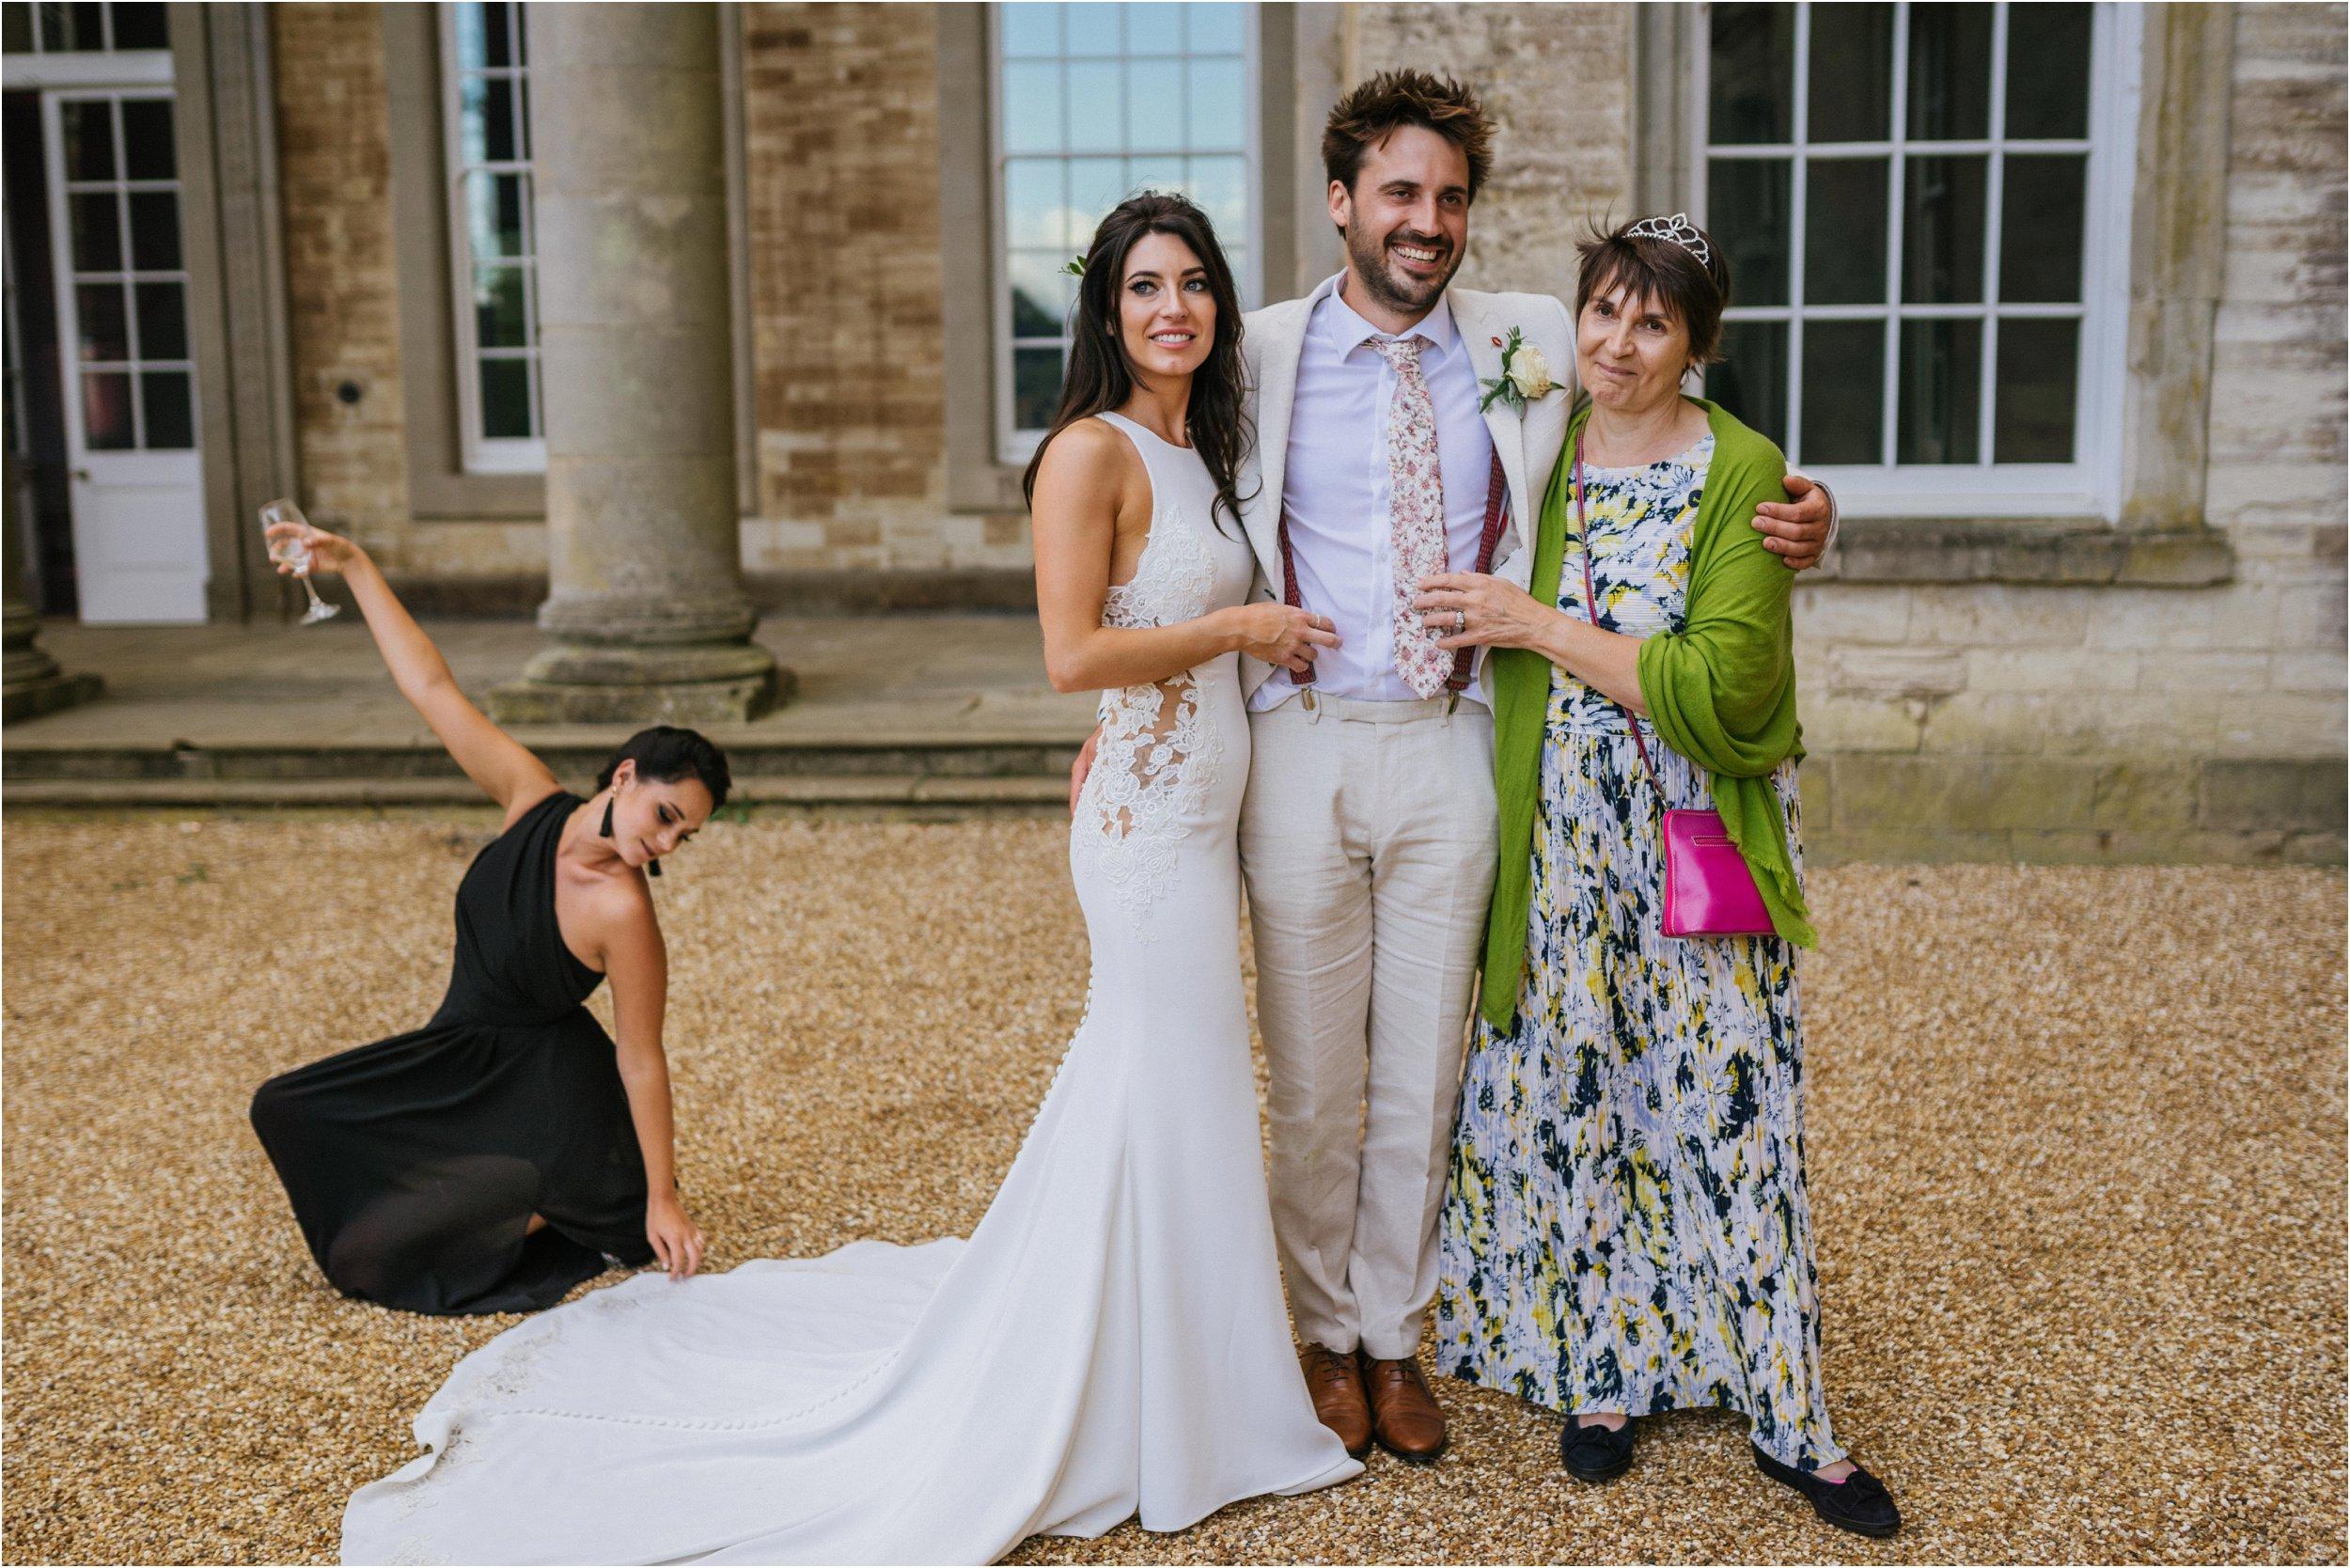 Compton Verney wedding photography_0151.jpg